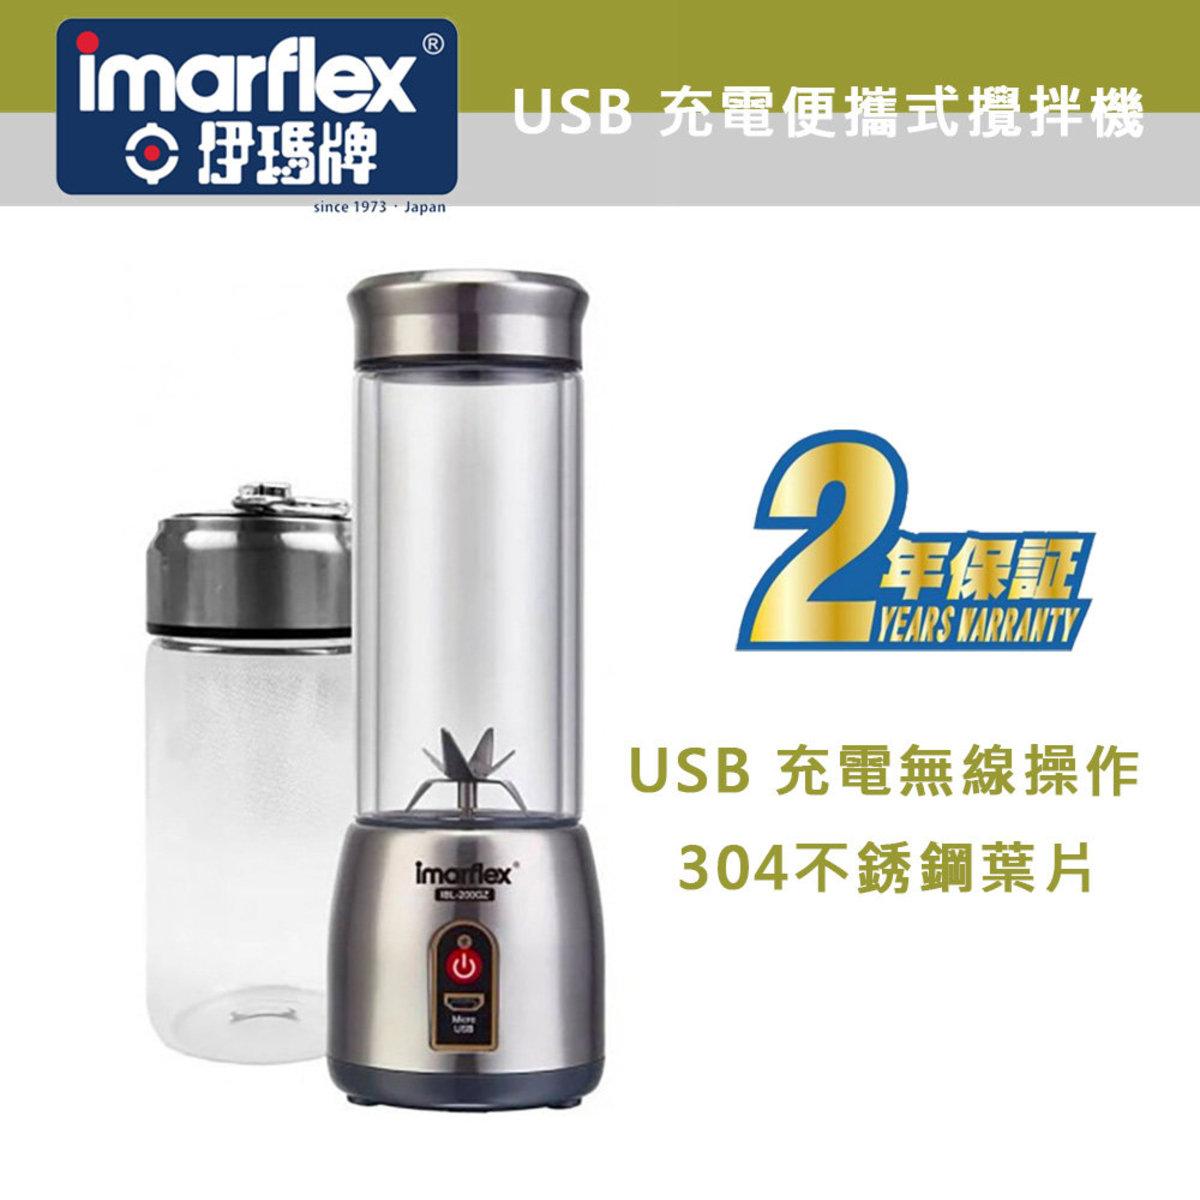 0.4L USB Rechargeable Mini Blender - IBL-200GZ